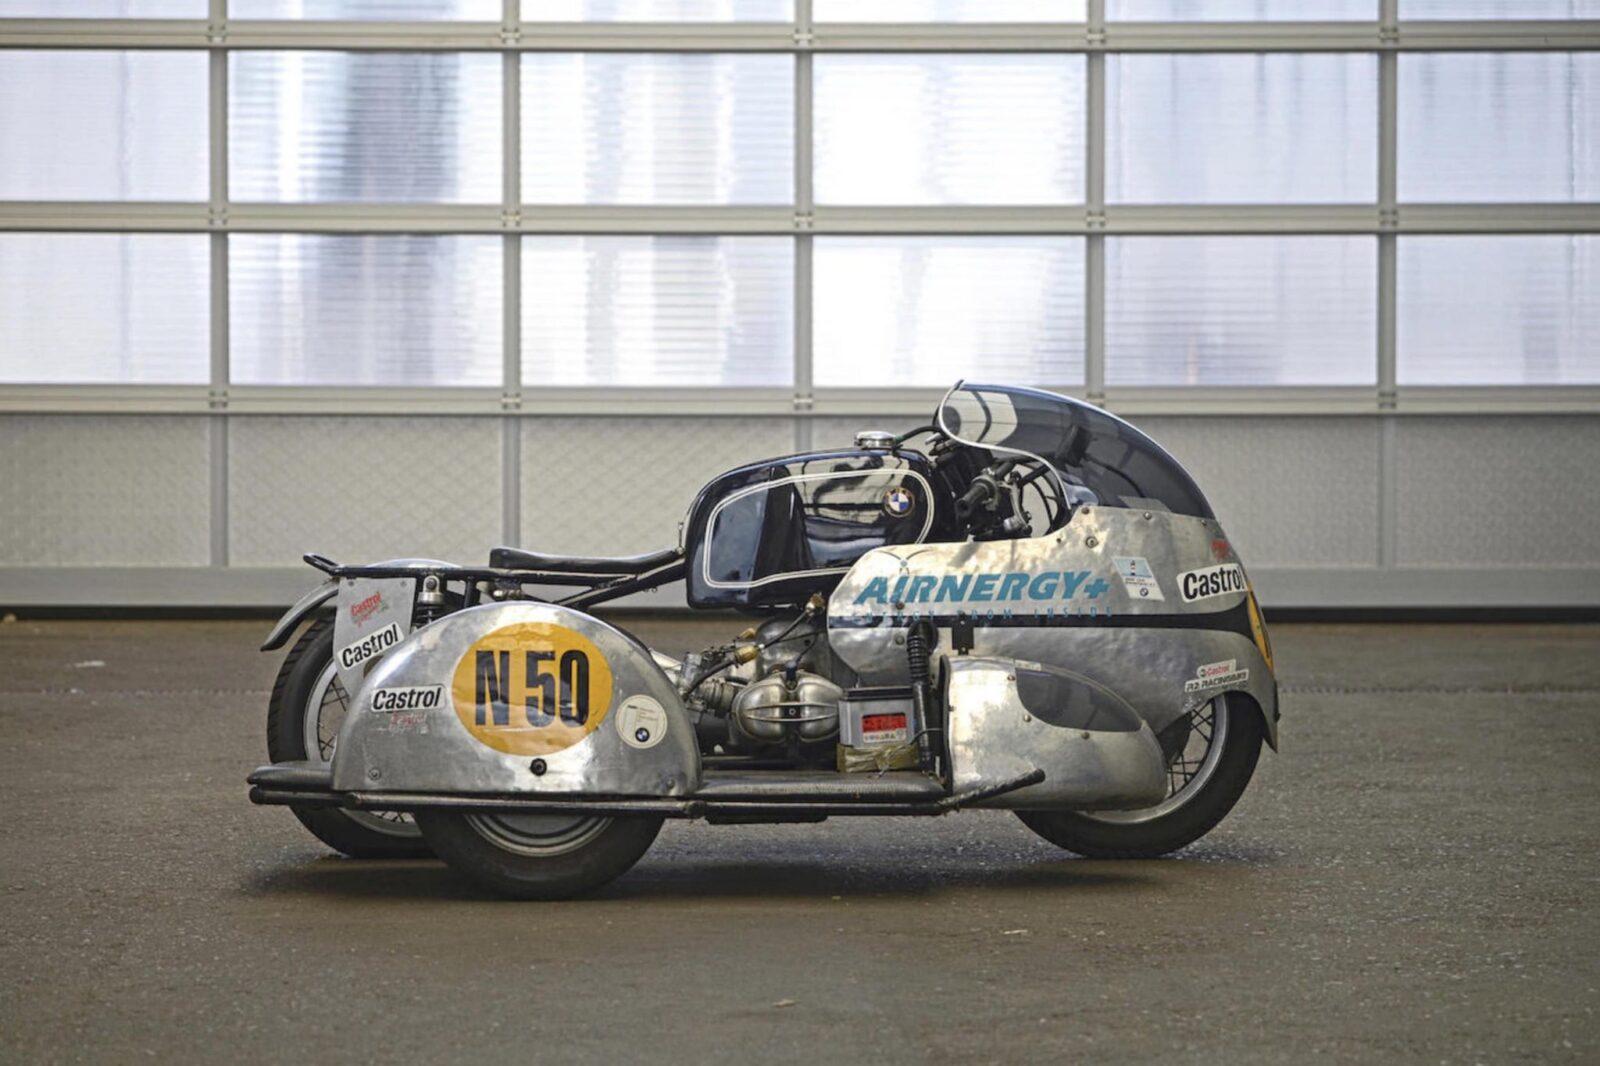 1957 BMW Racing Kneeler Motorcycle